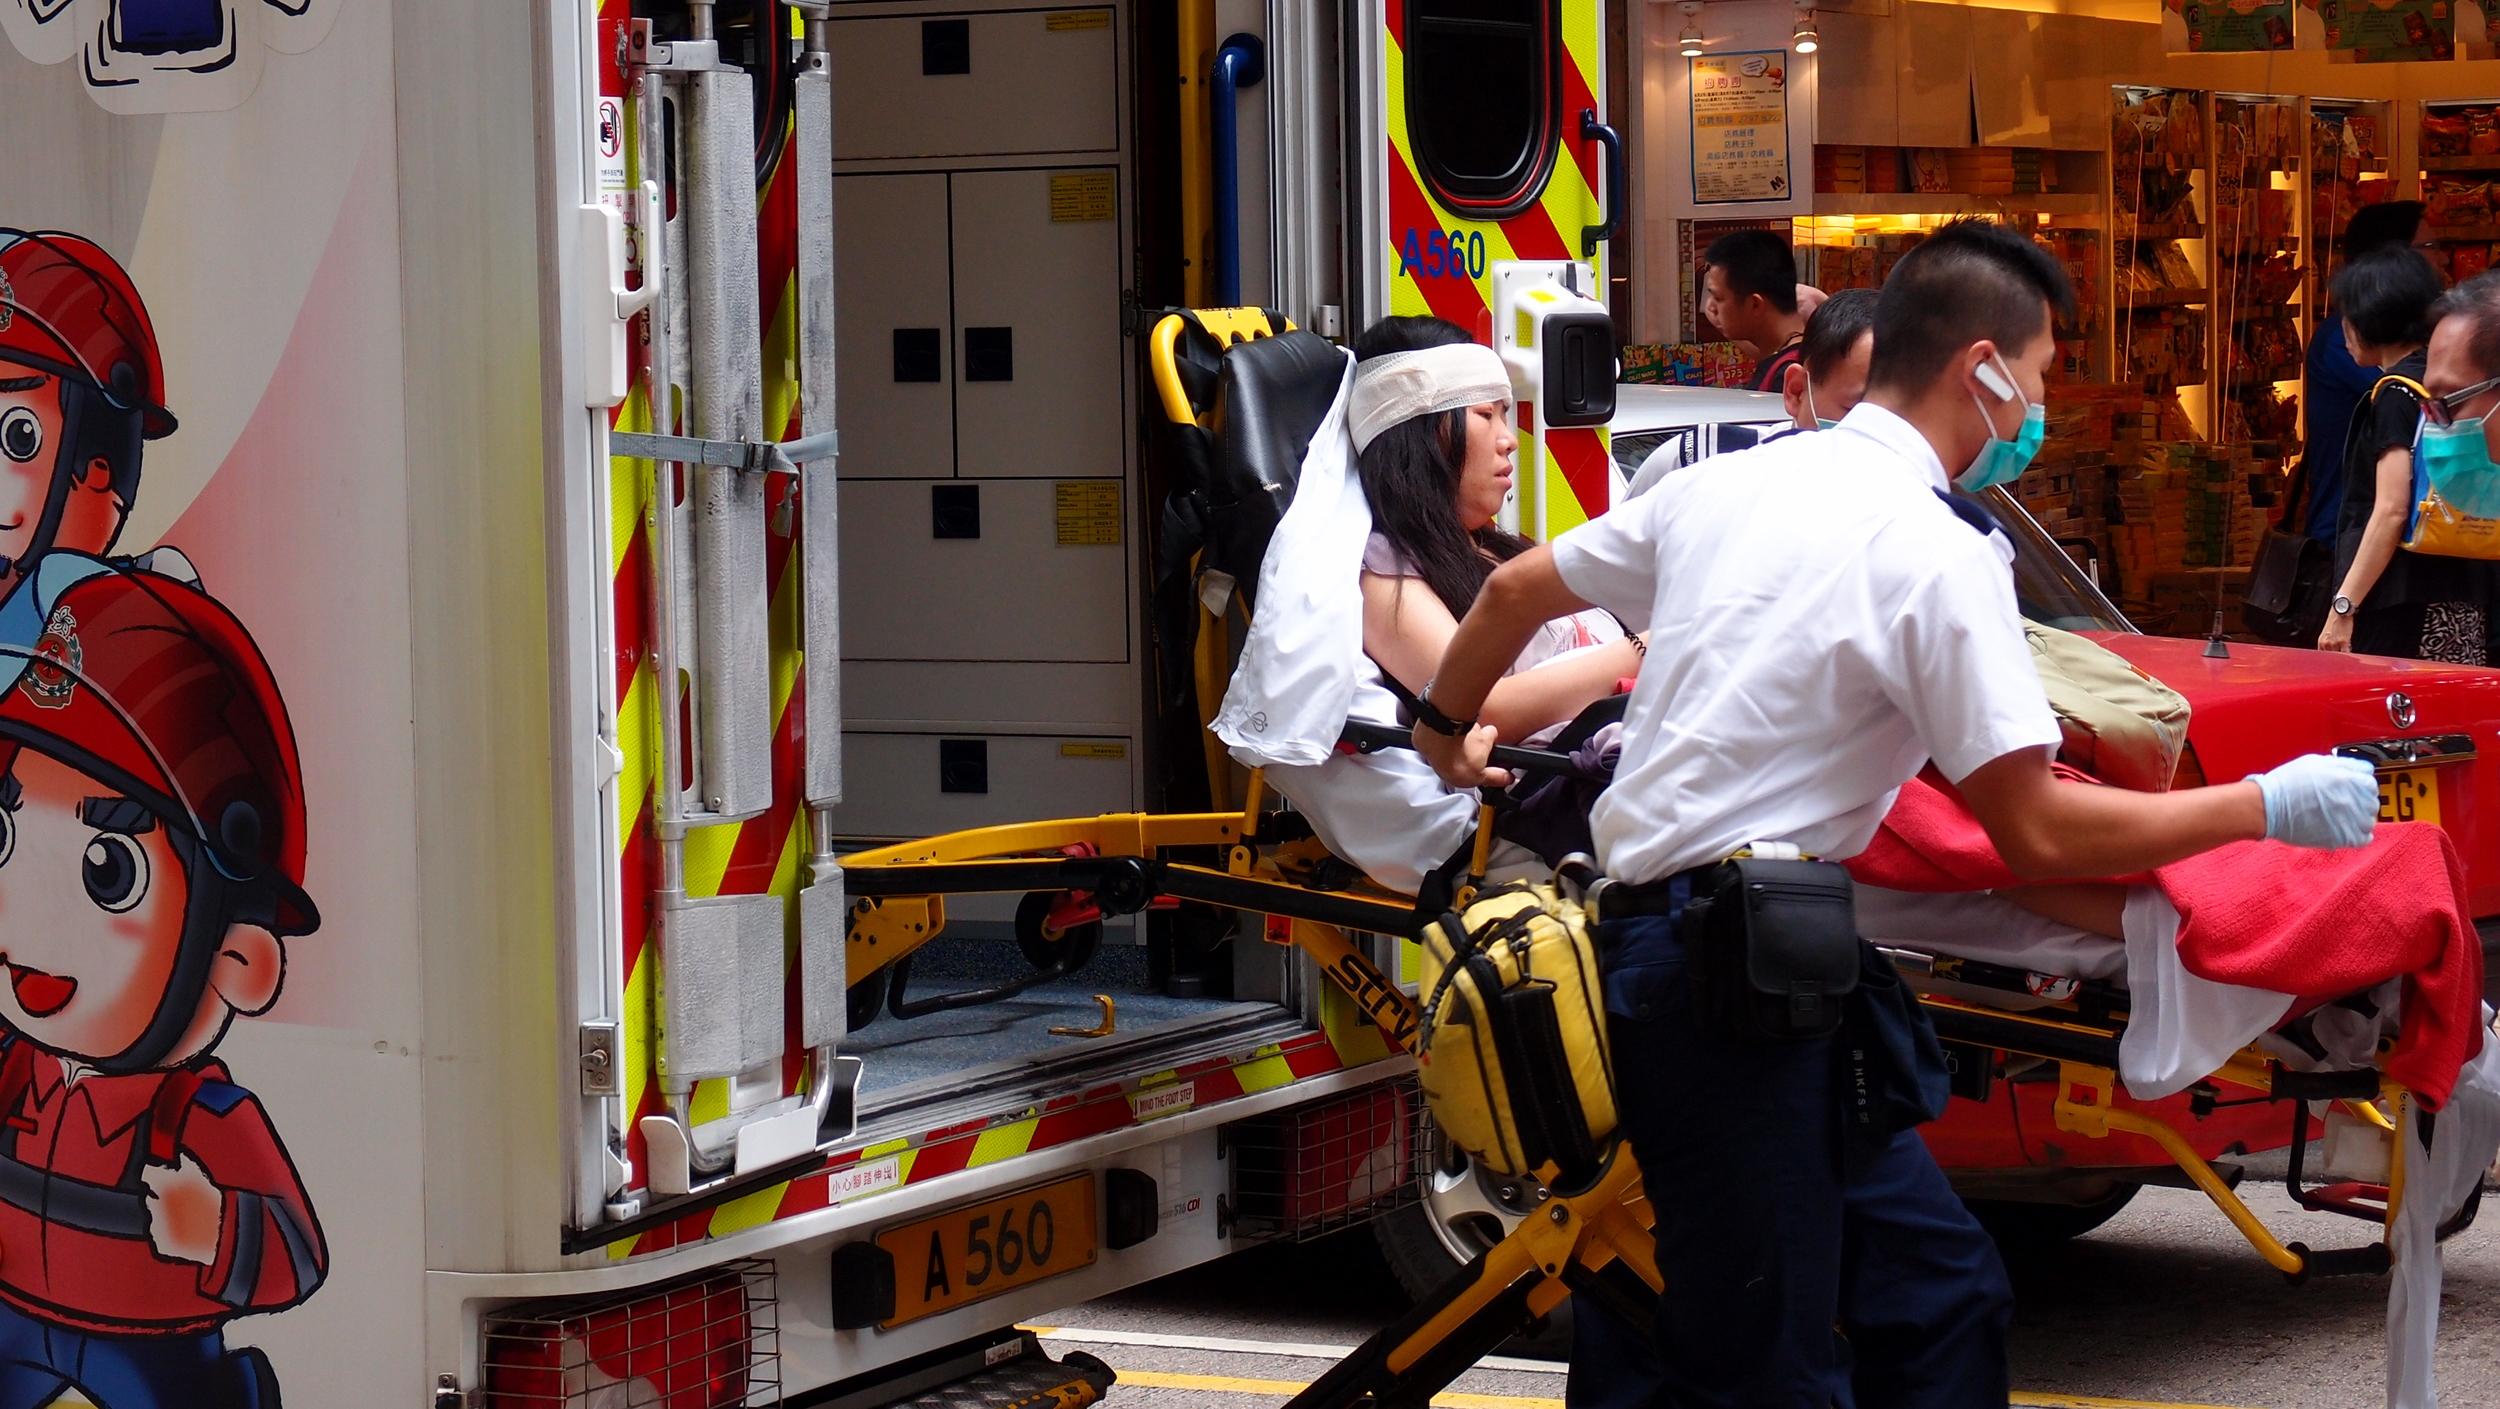 A medical emergency in Mongkok